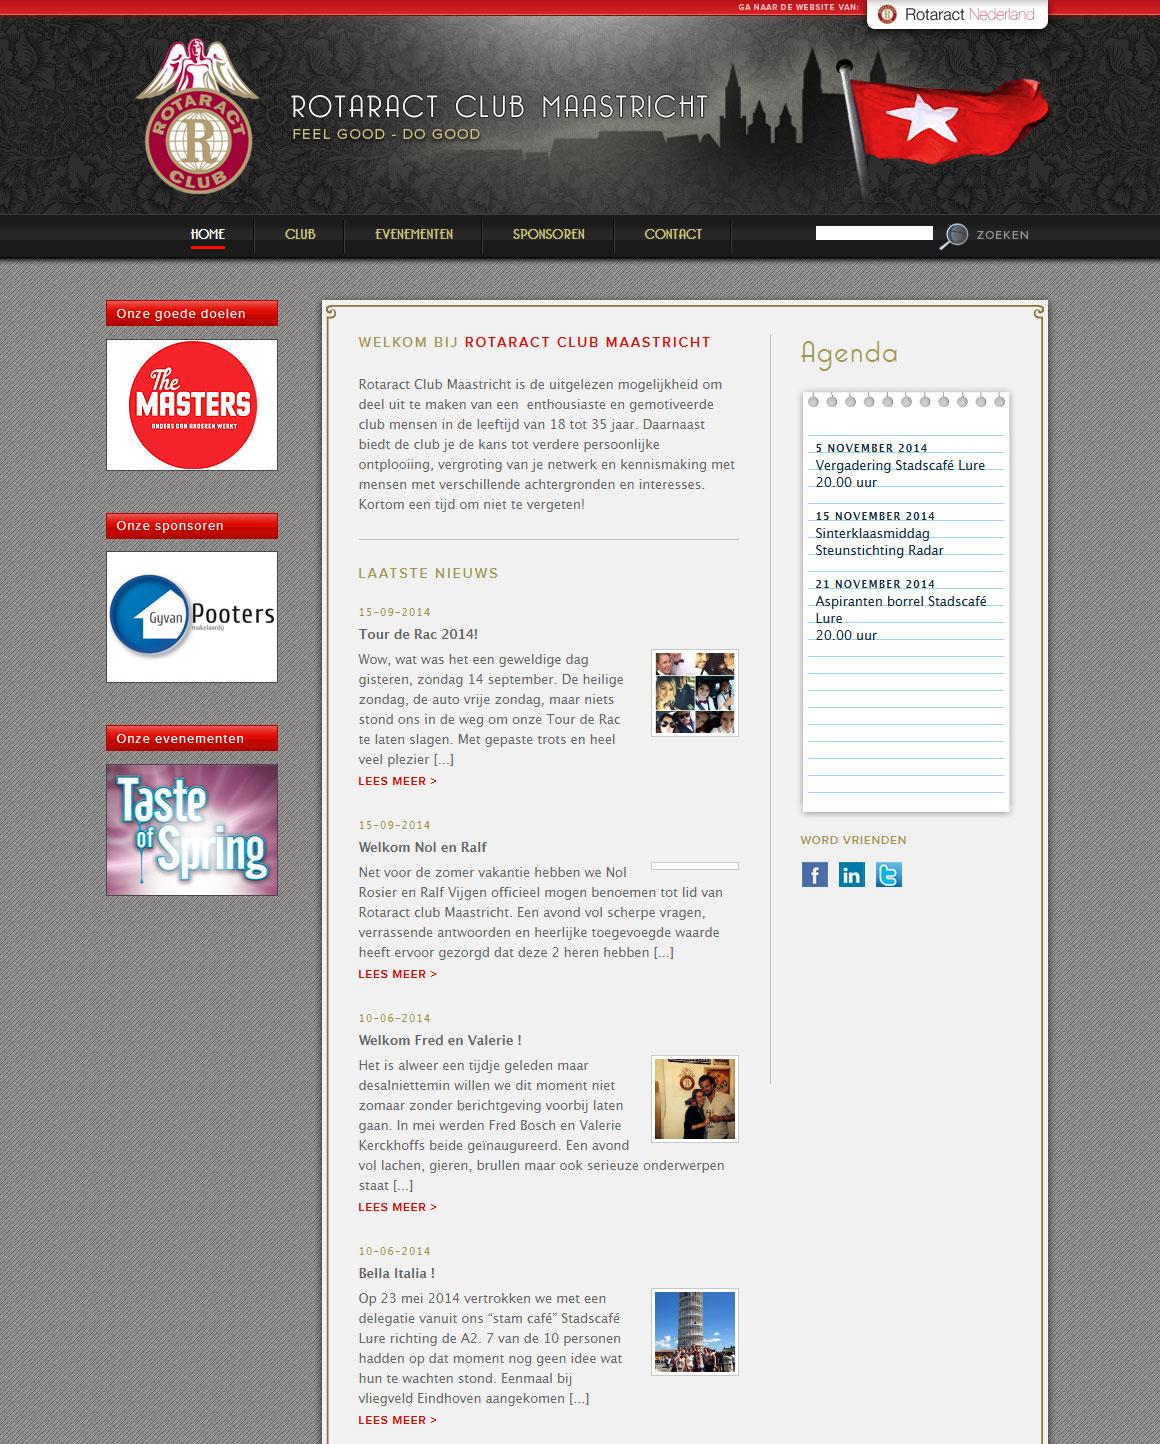 rotaract-maastricht_website1